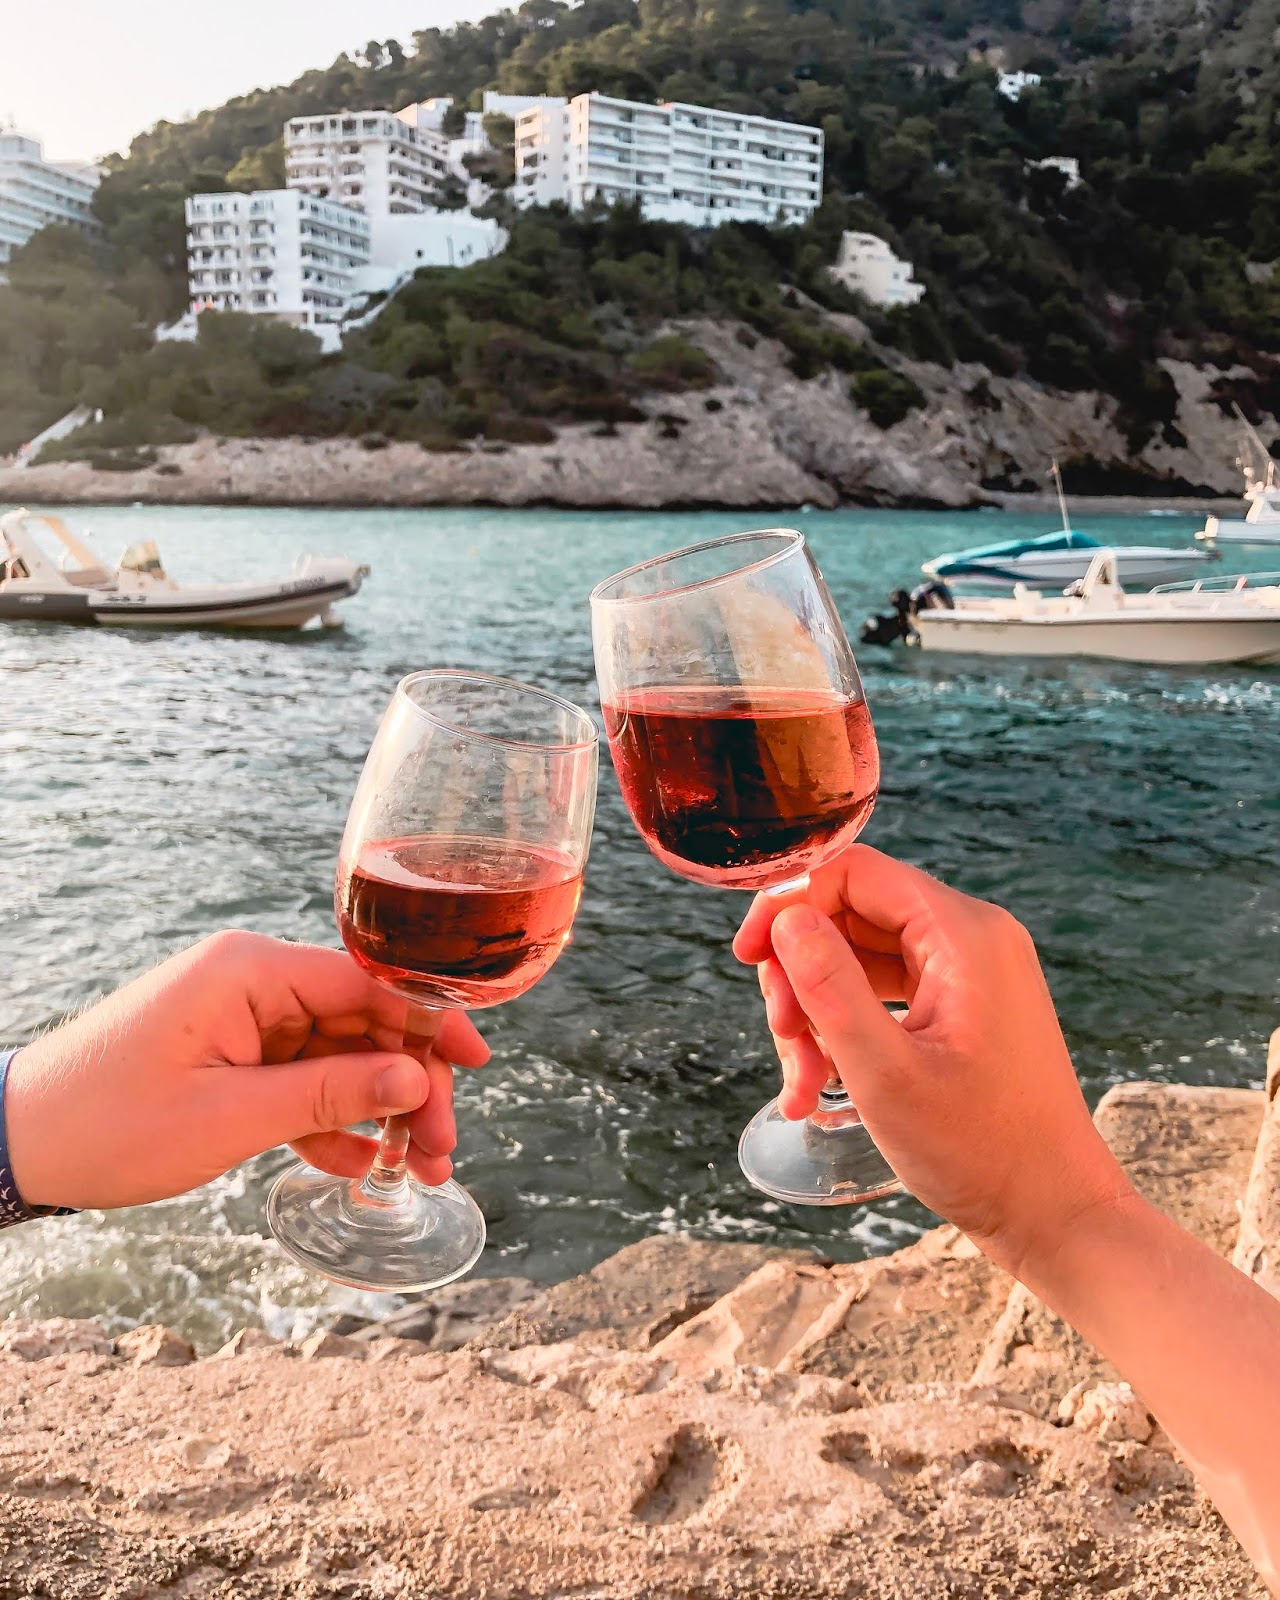 Postcards Ibiza, Summer 2019, copyright Eline Rewinkel